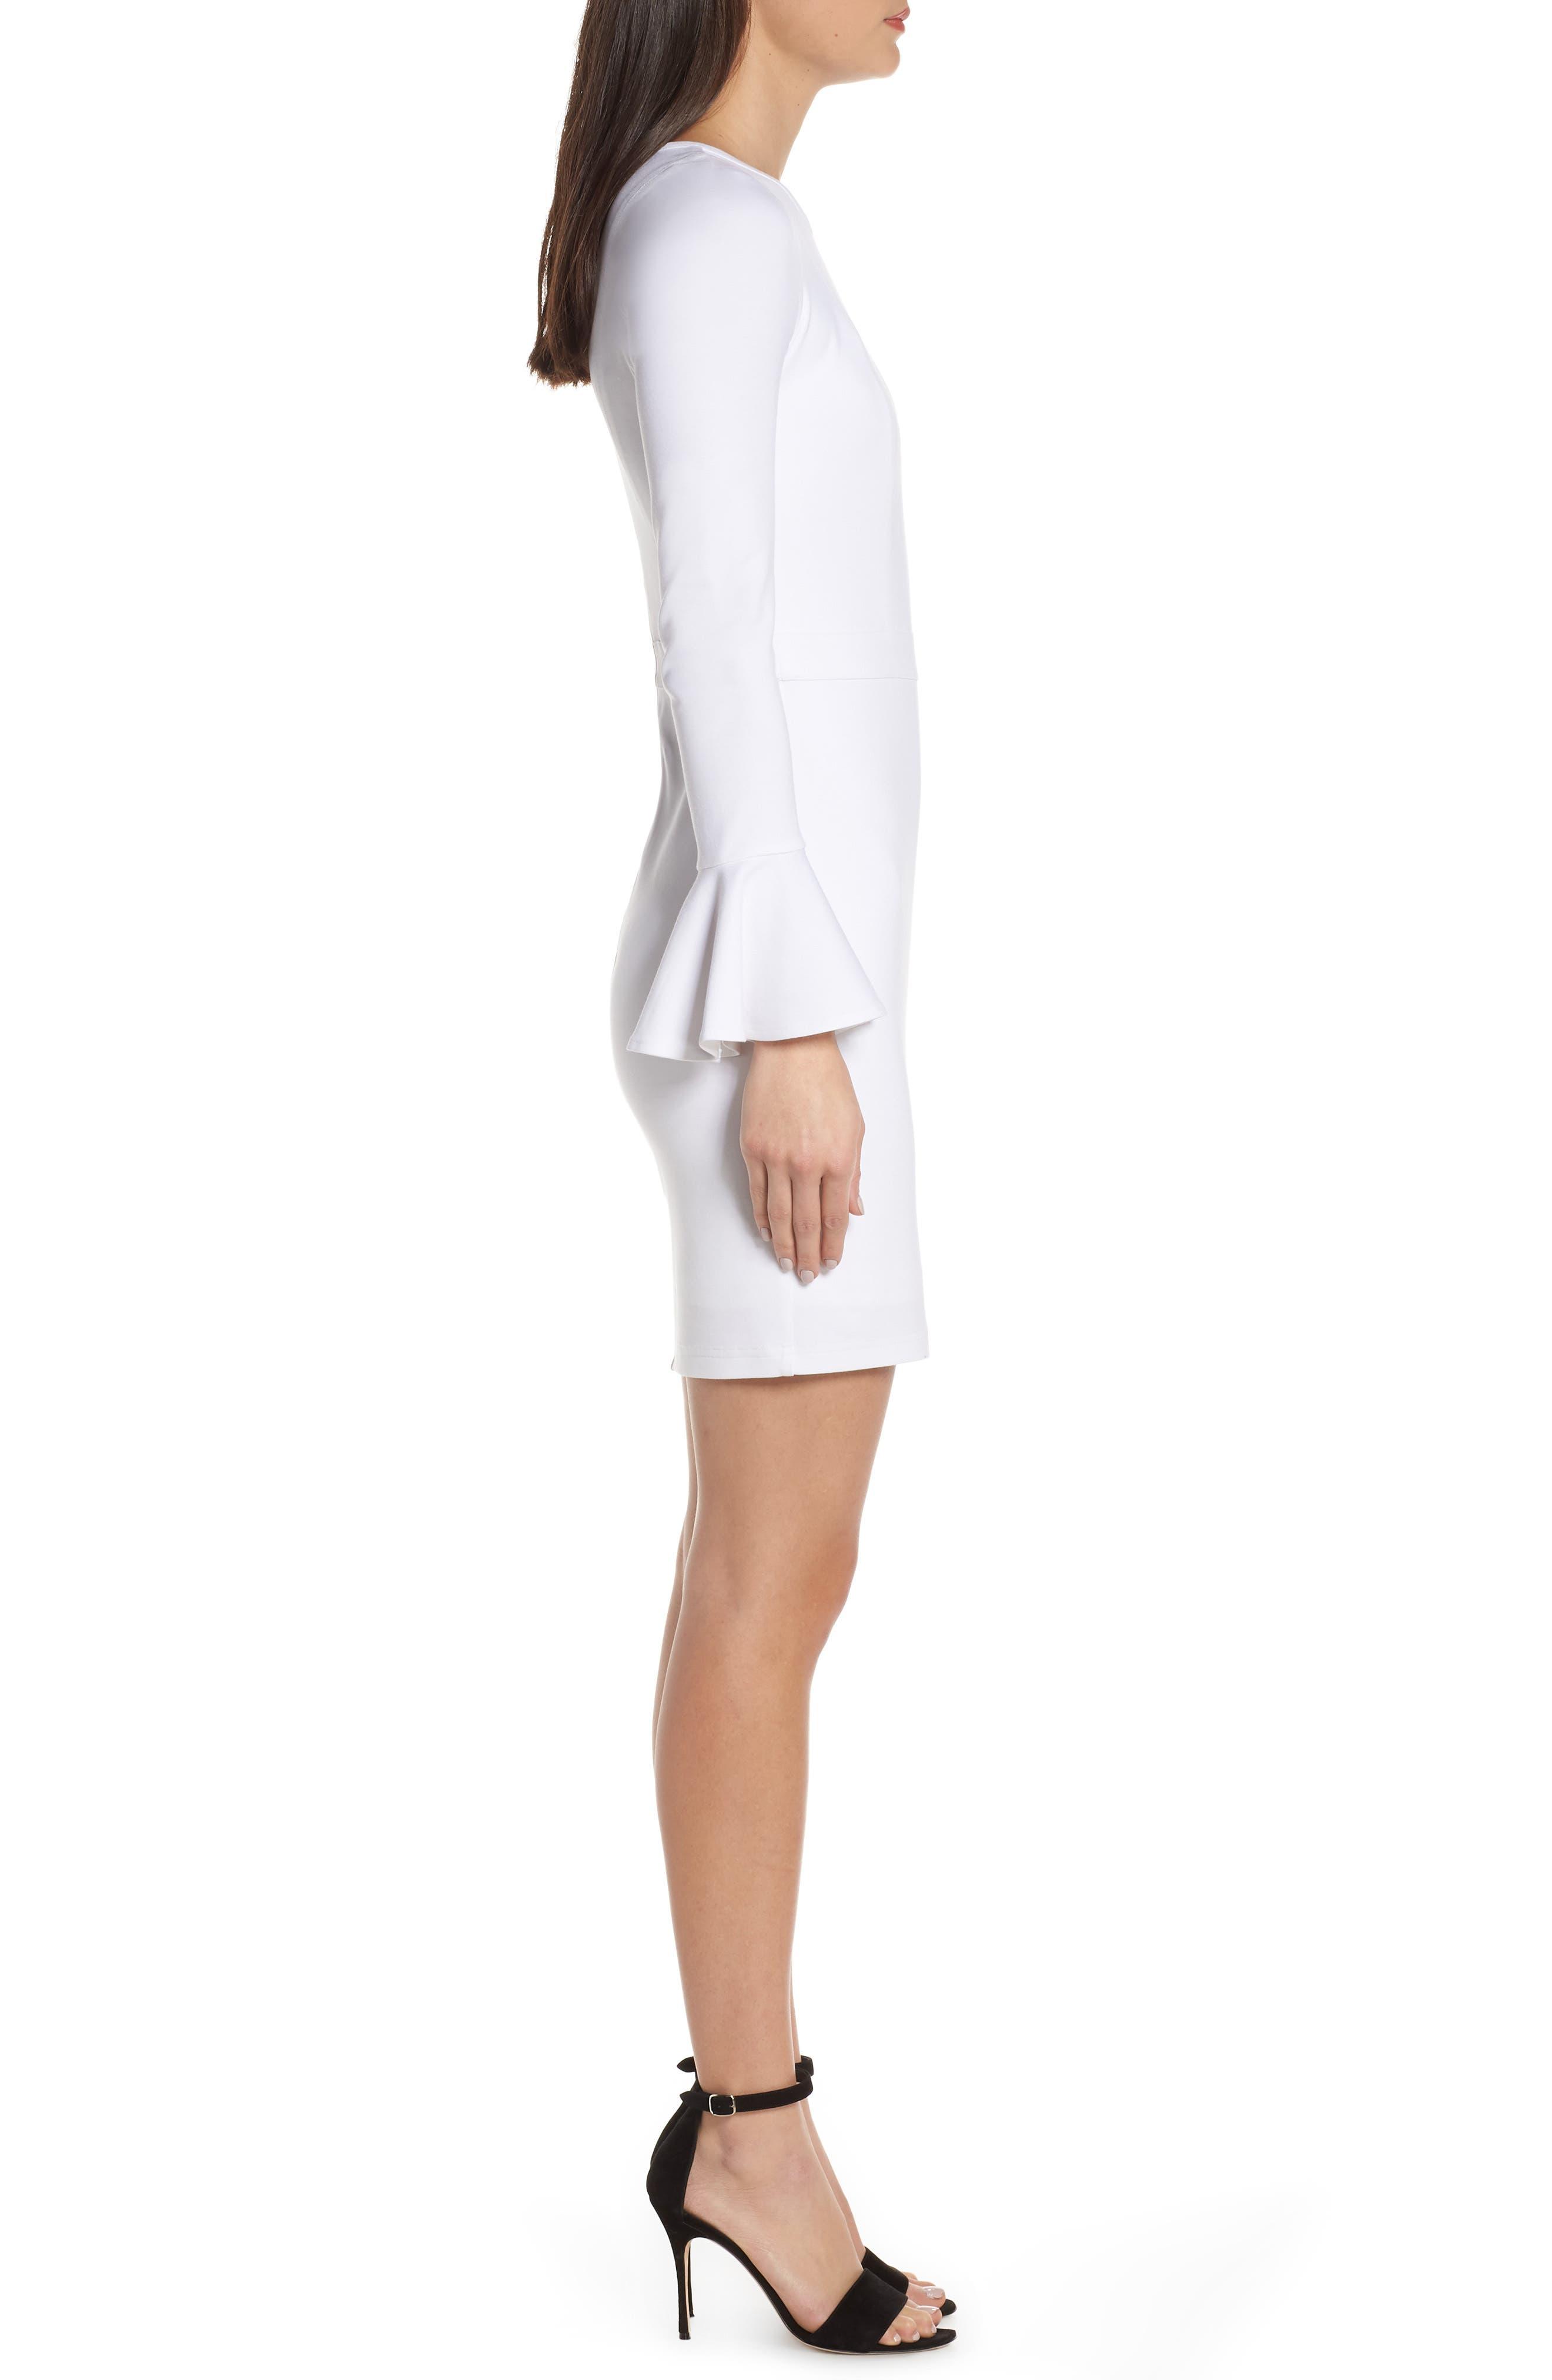 ALI & JAY, Pavillion Bell Cuff Sheath Dress, Alternate thumbnail 4, color, WHITE